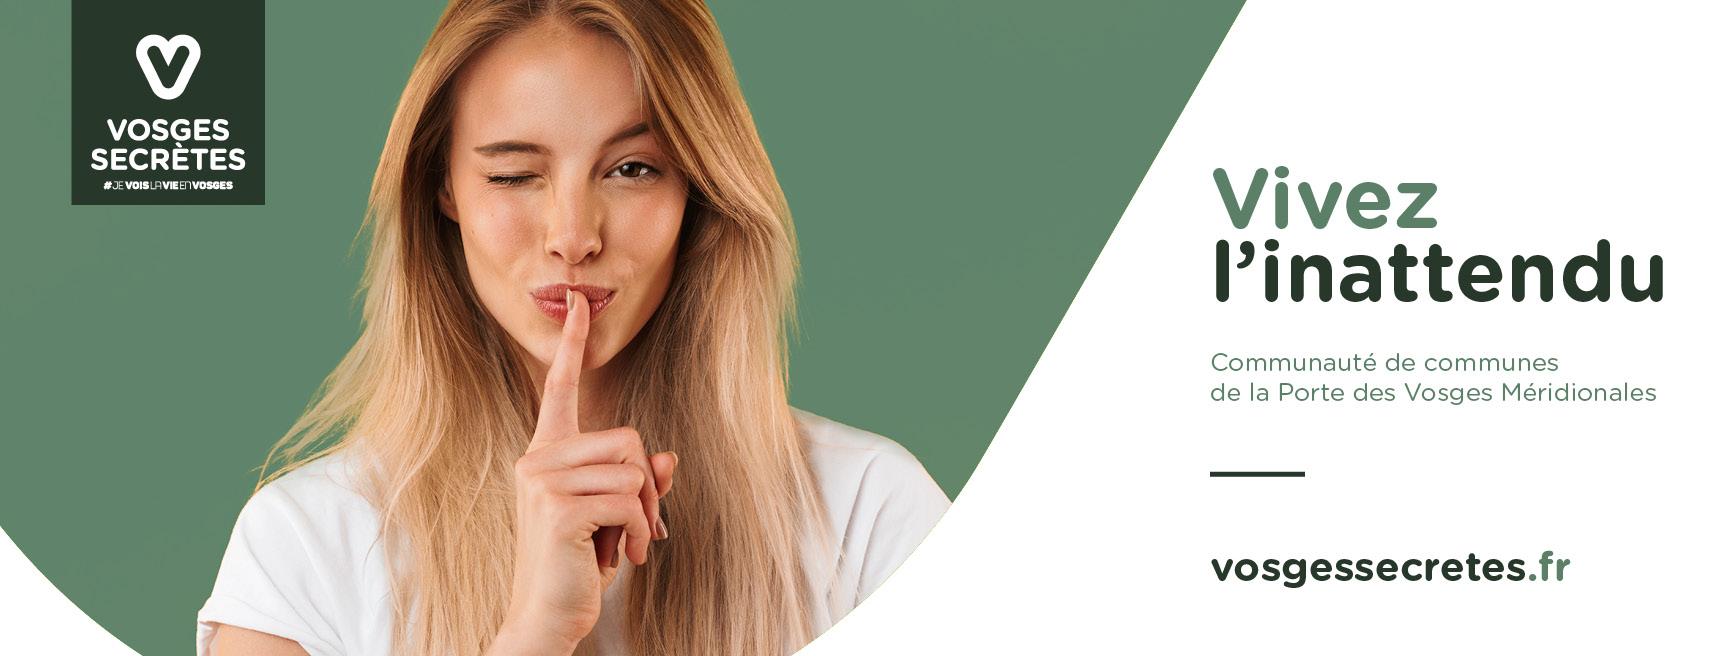 Vosges Secrete – facebook – Baniere –